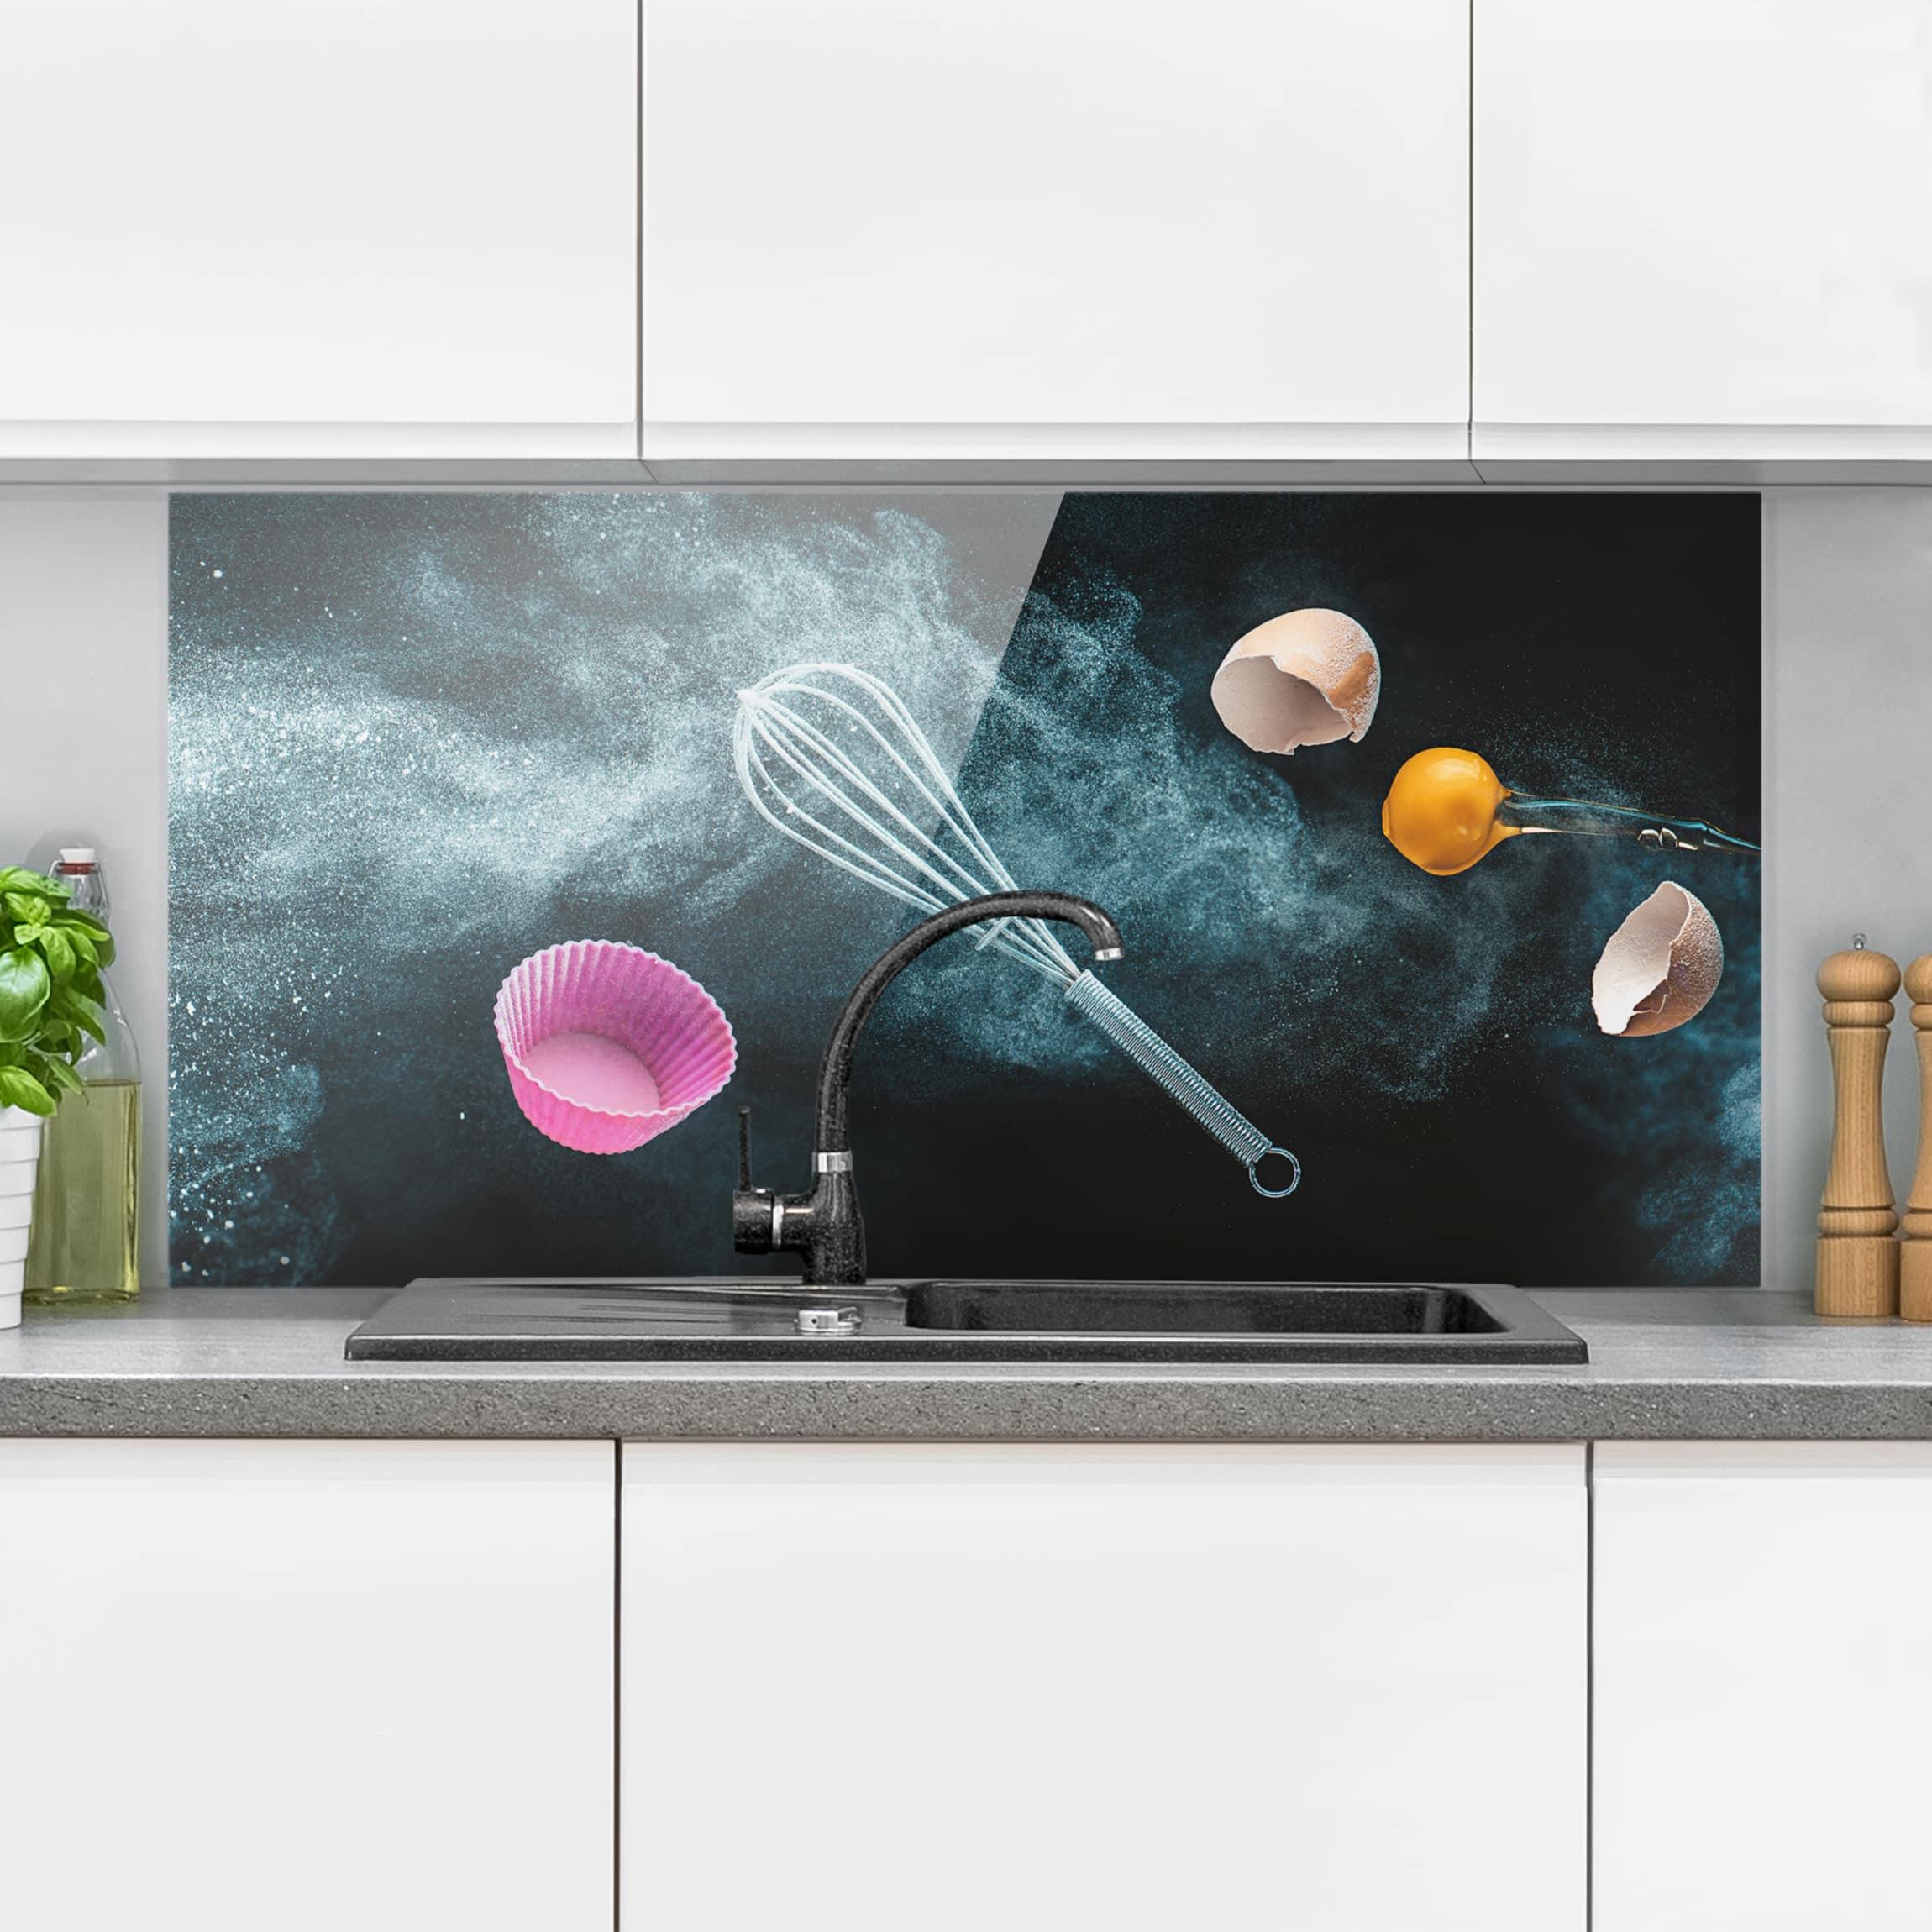 spritzschutz glas chaos in der k che quer 1 2. Black Bedroom Furniture Sets. Home Design Ideas